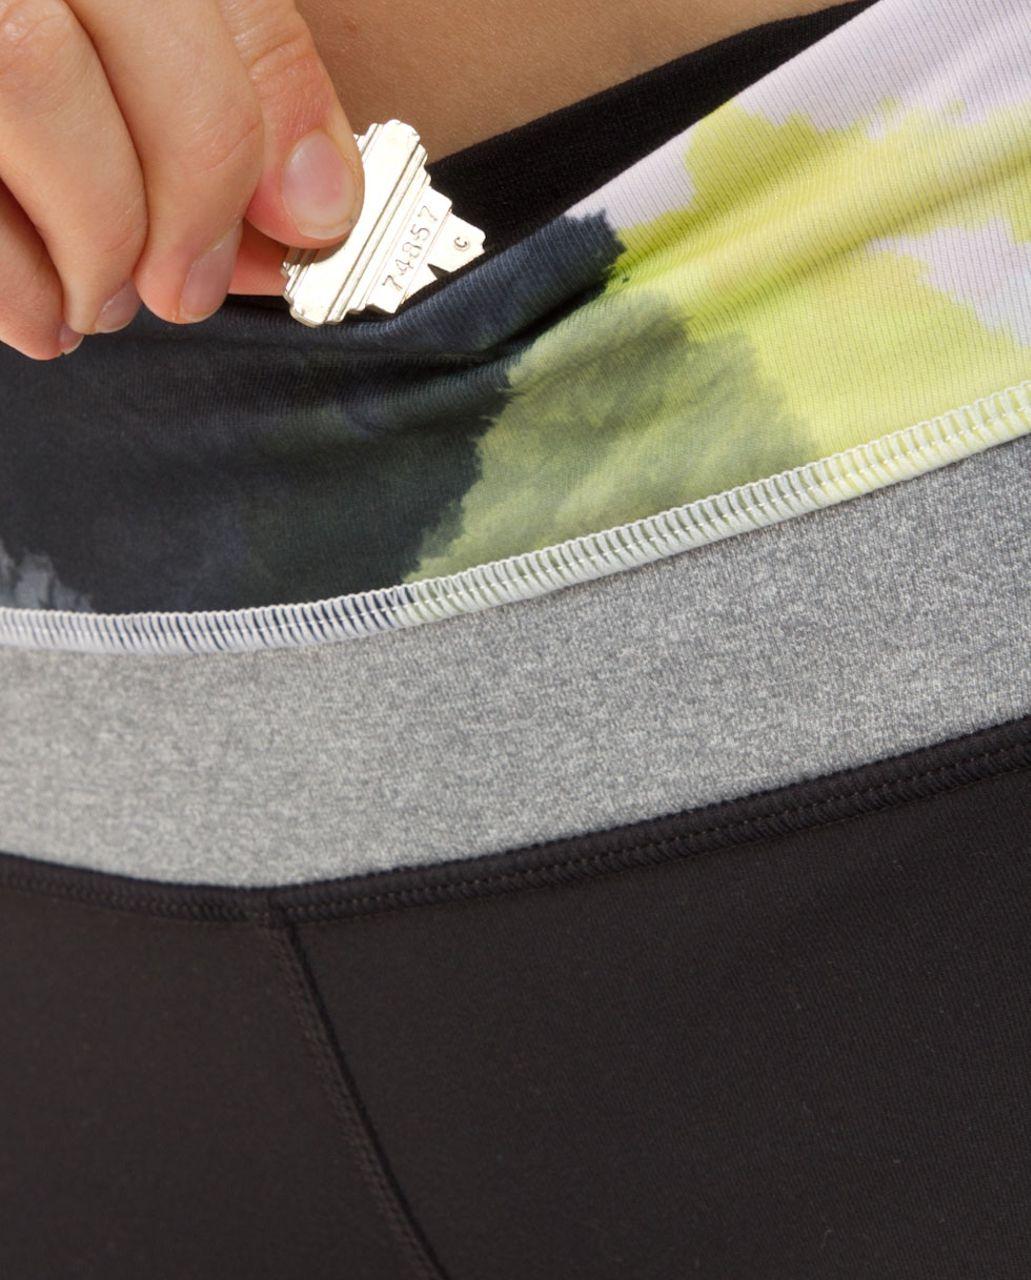 Lululemon Groove Pant (Tall) - Black /  Black Citron Tinted Canvas Super /  Heathered Blurred Grey